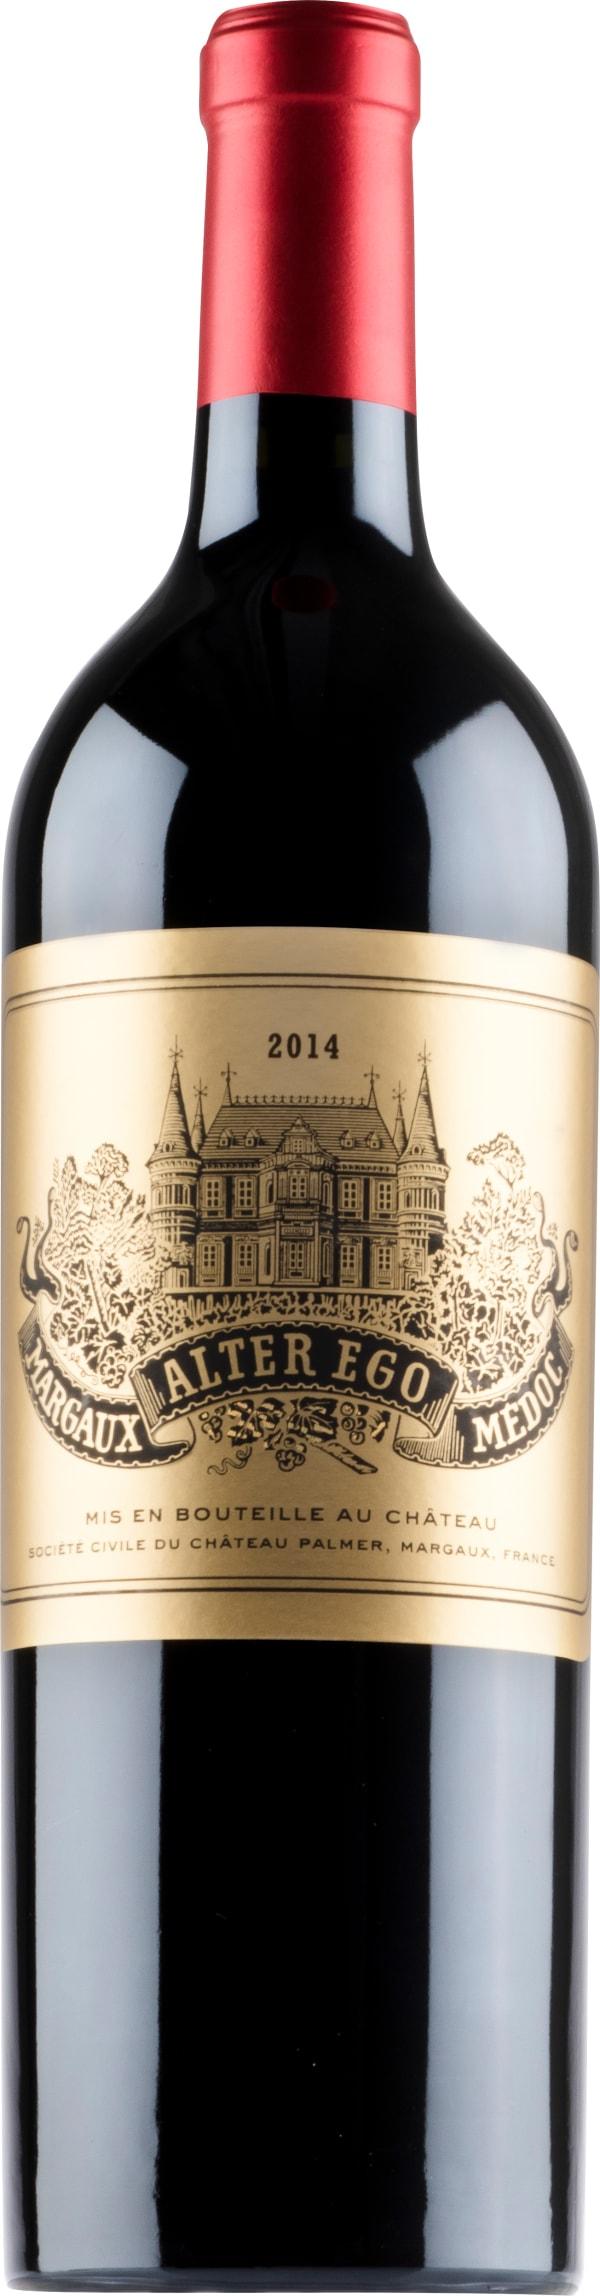 Alter Ego 2014